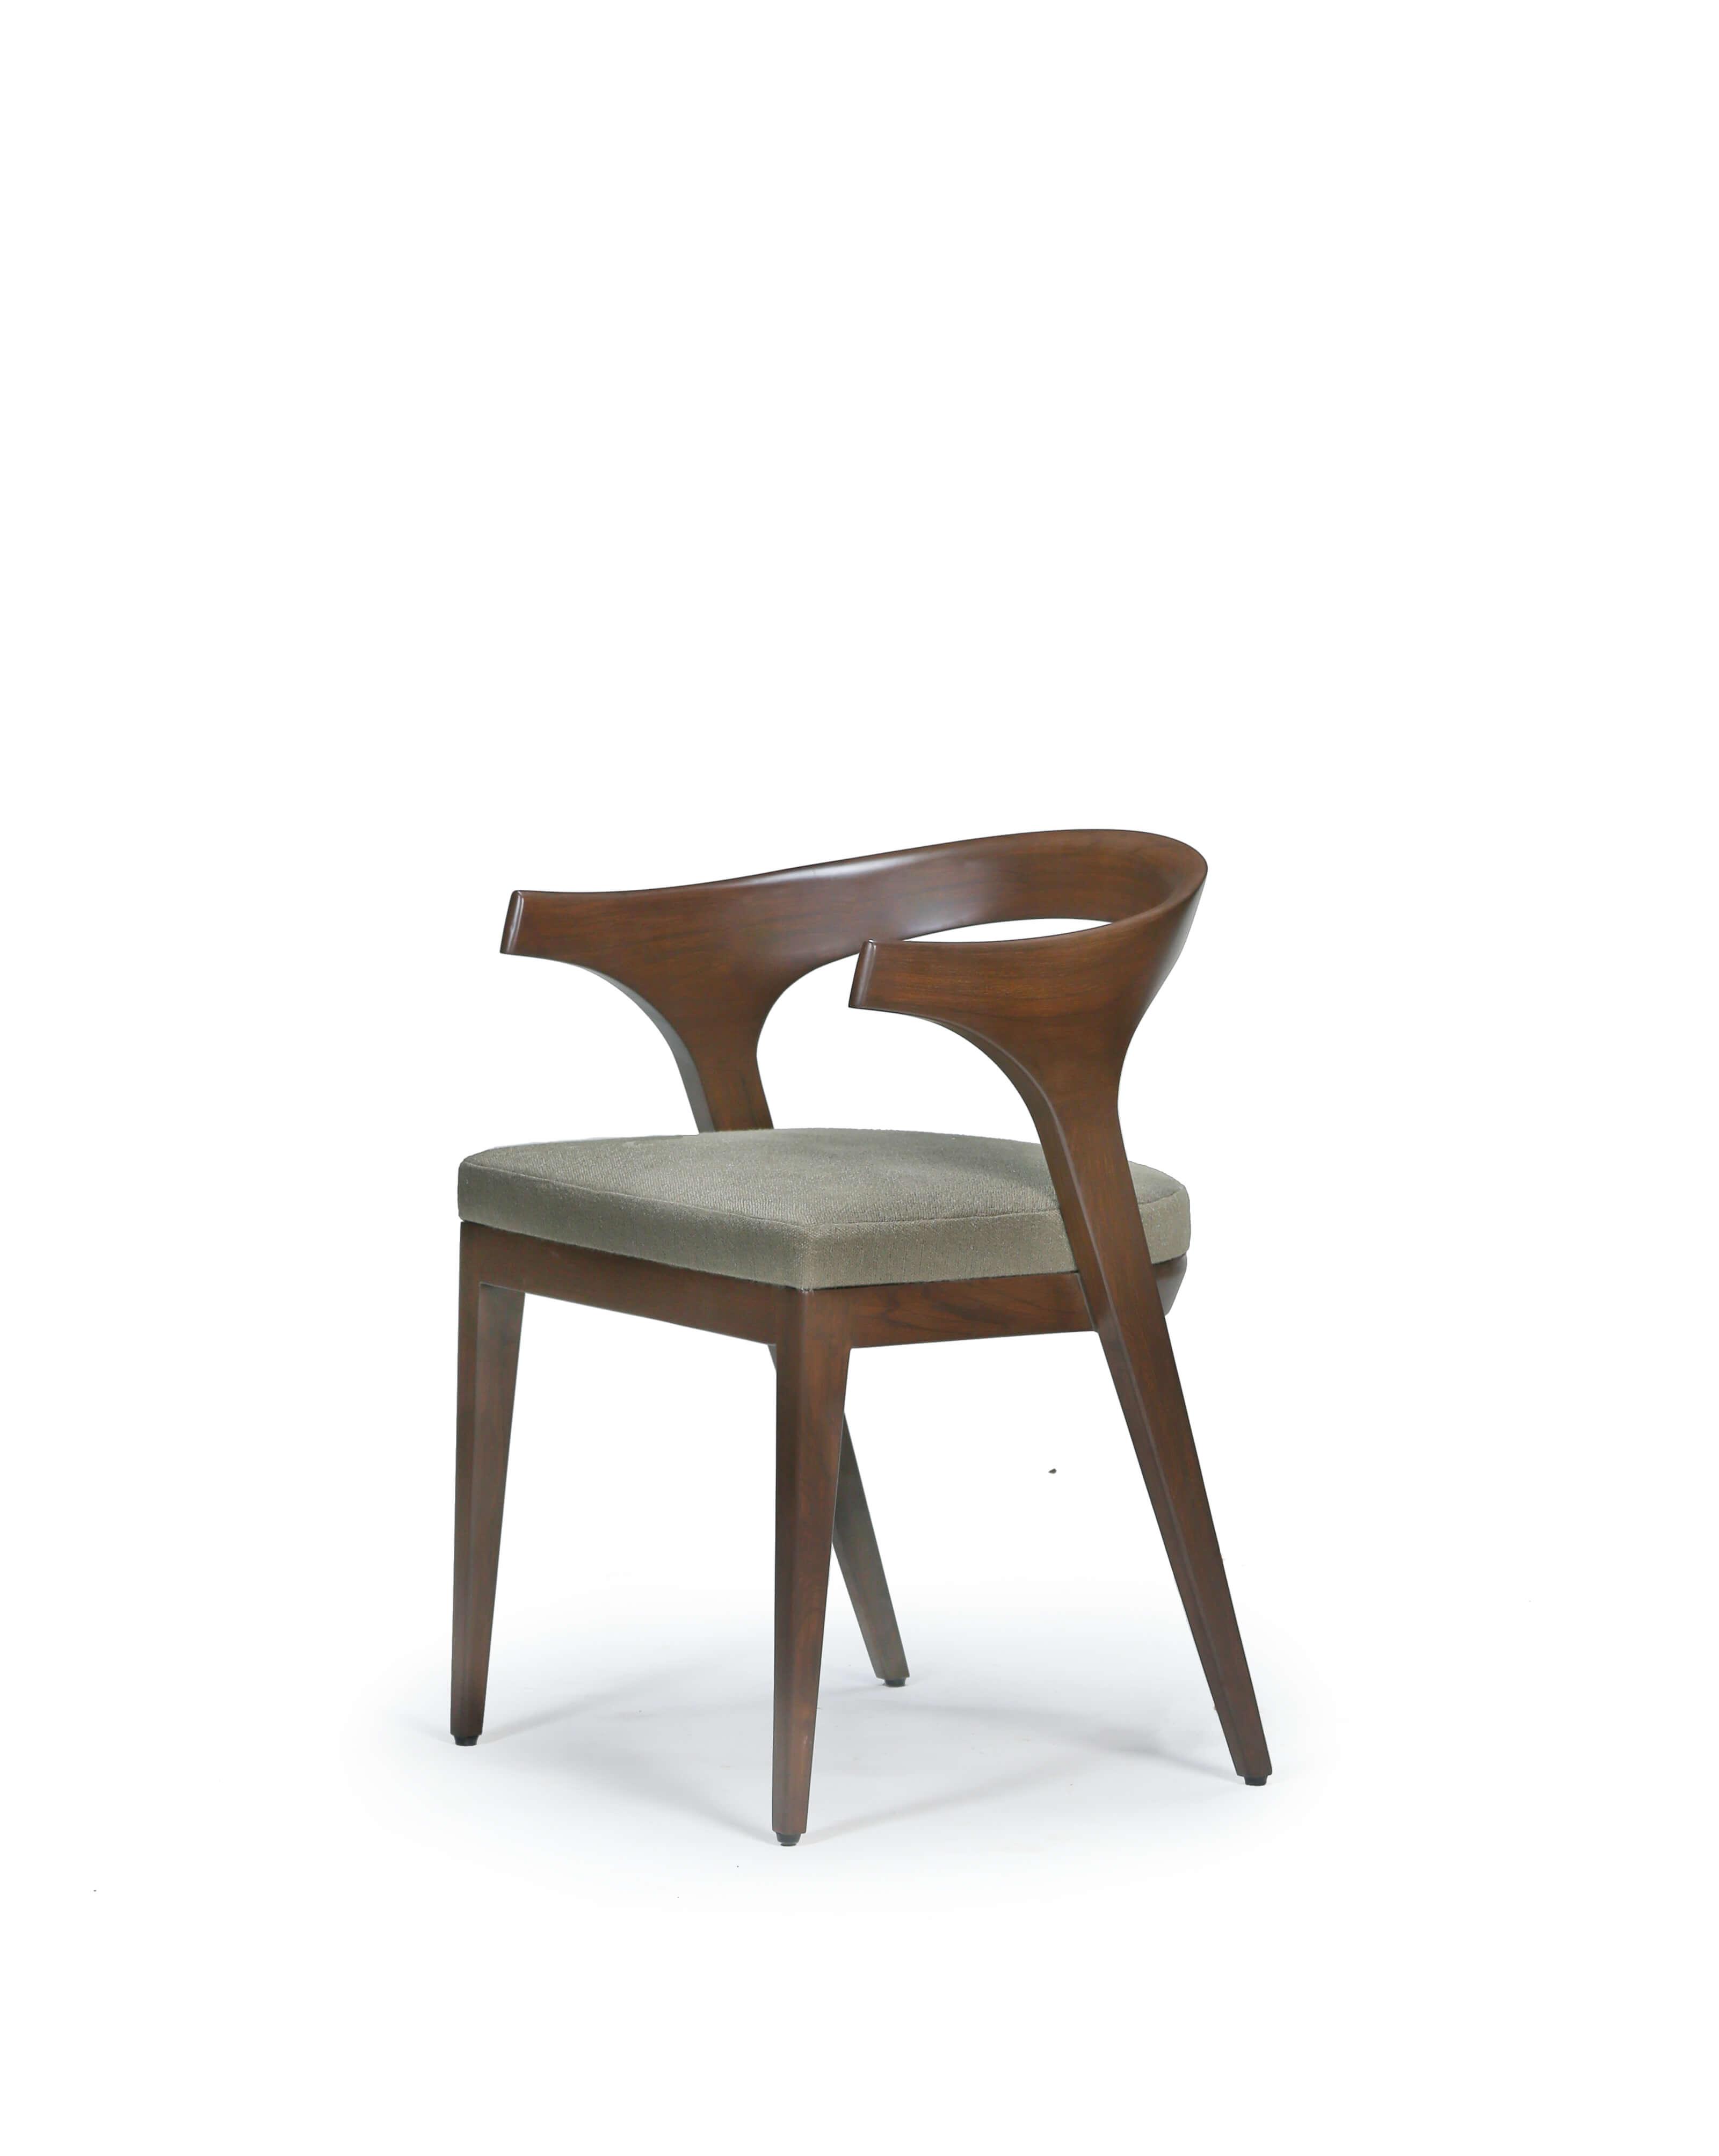 Horn chair (3)